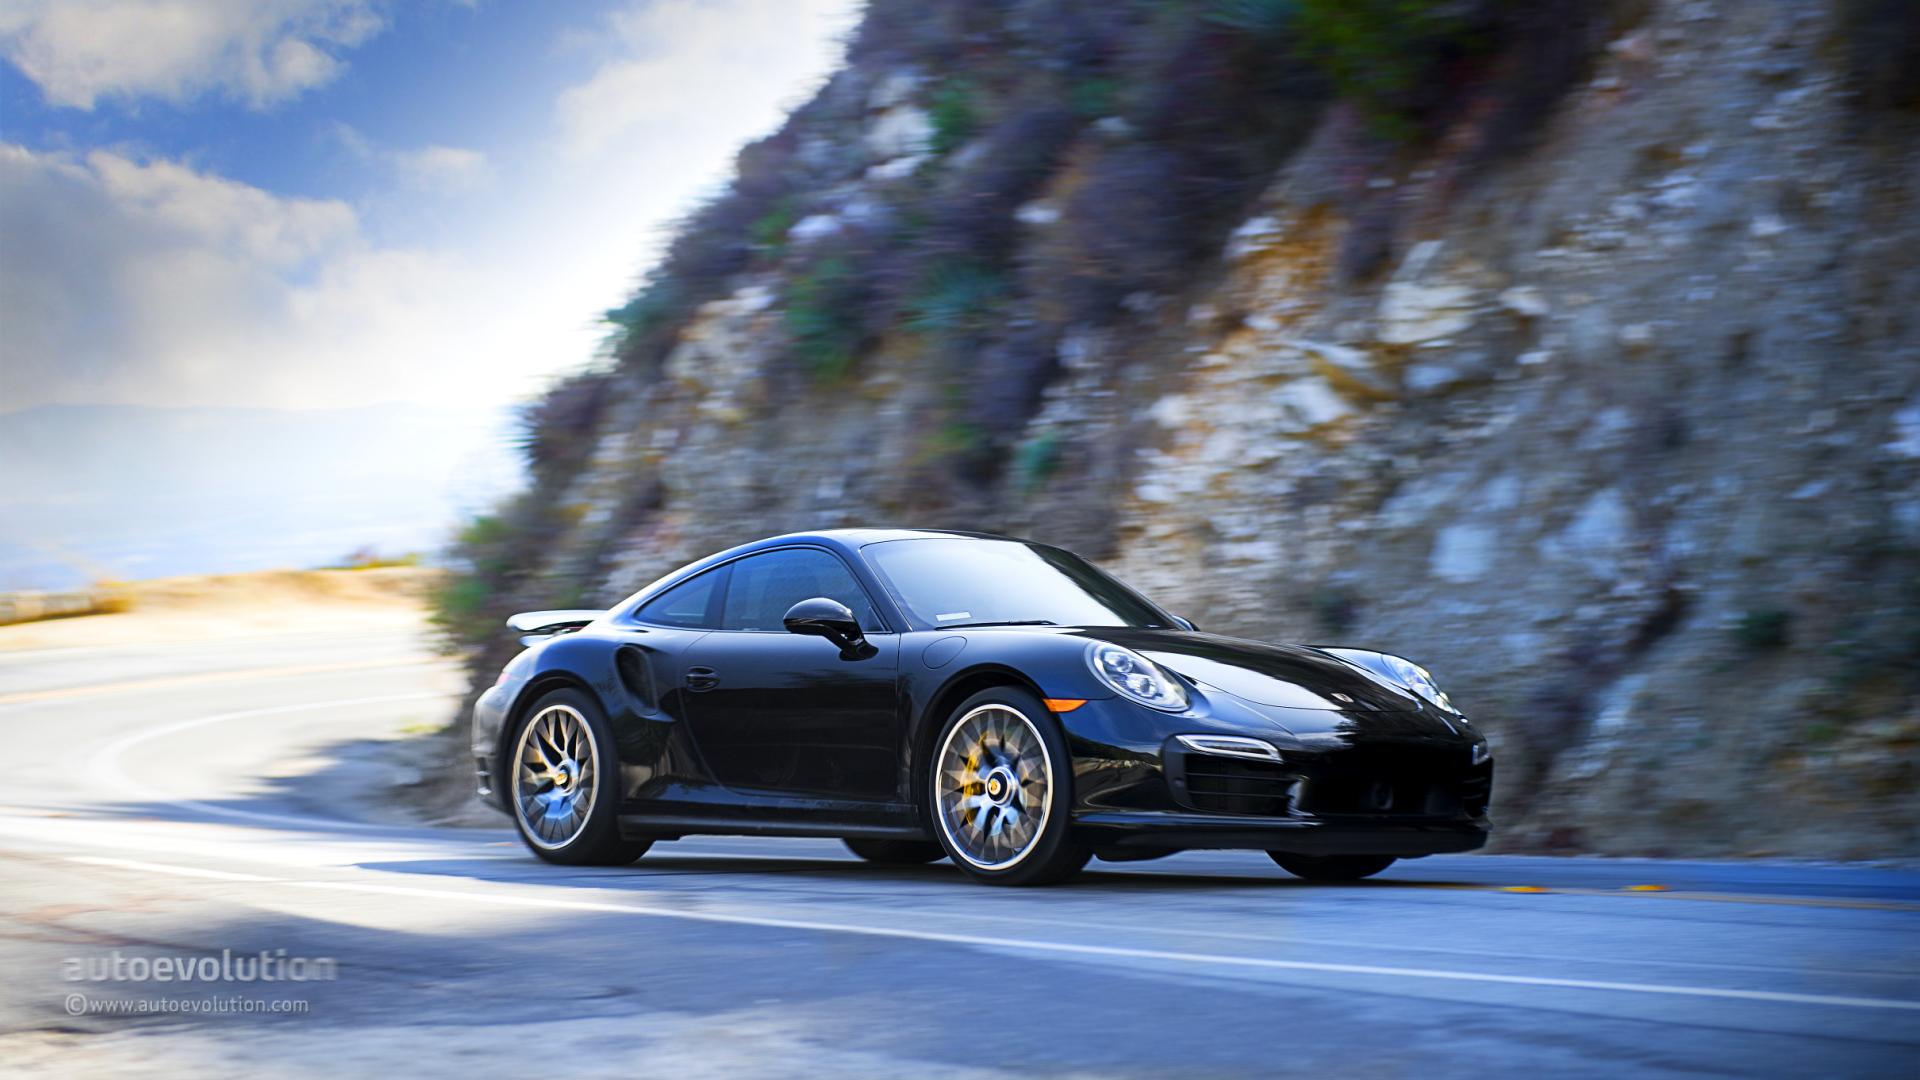 Porsche Working on 700 HP Hybrid 911 and Panamera: 2017 Plan ... on blue 911 turbo, 2005 porsche cayenne turbo, 2017 porsche boxster, 2016 porsche cayenne turbo, 2017 porsche cayenne, 2017 porsche panamera turbo, 2017 porsche panamera convertible, 2017 porsche roadster, 2017 porsche 918 spyder, 2017 porsche 918 turbo, 2017 porsche gt2, 2017 porsche panamera 4s, 2017 porsche gt3, 2017 mazda rx-7 turbo, 2017 porsche panamera gts, 2017 porsche cayman, 2017 ford focus turbo,